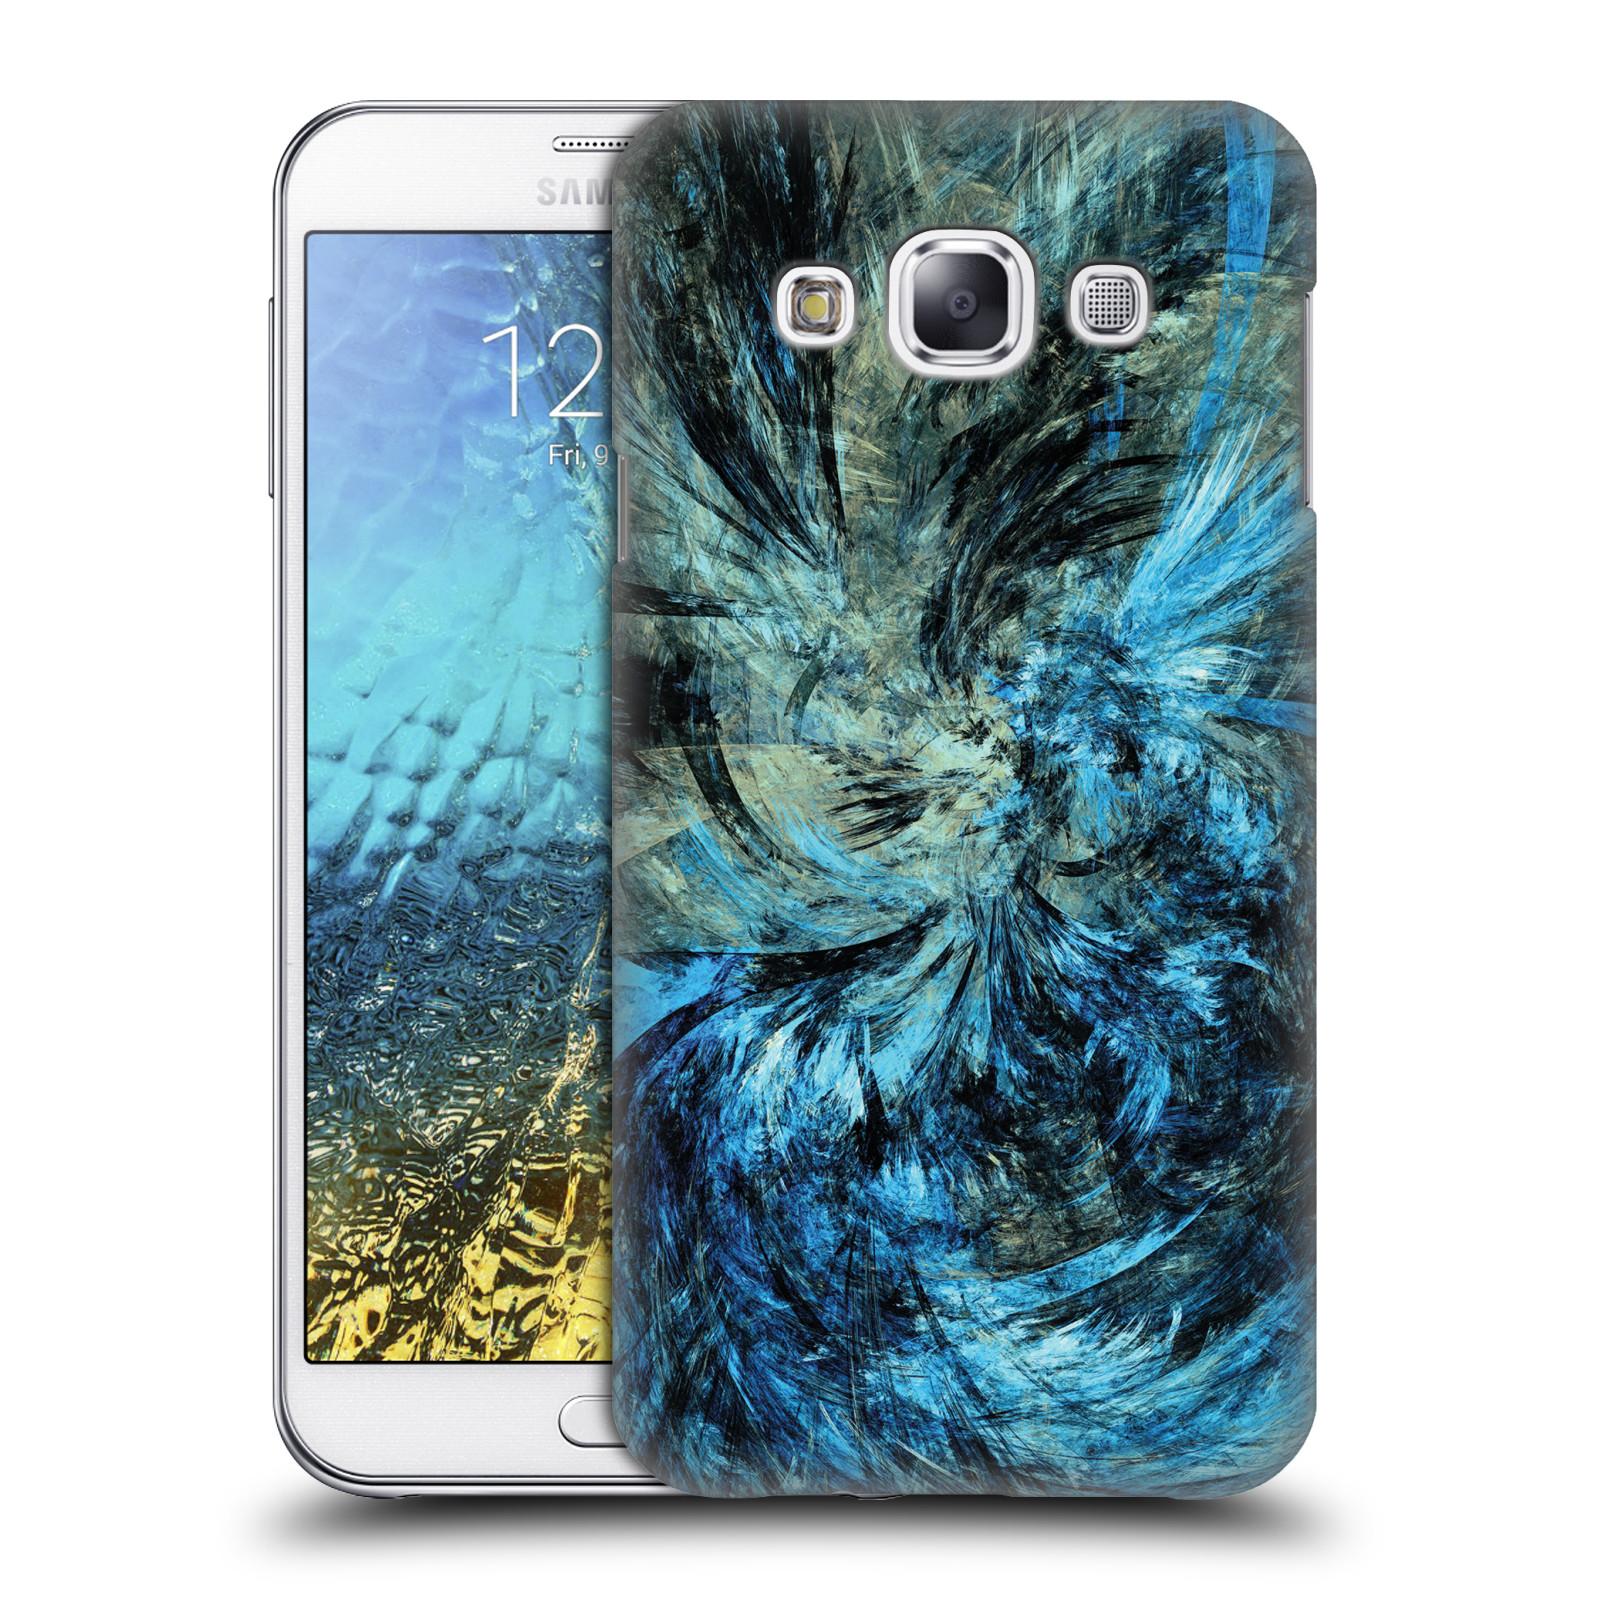 ... ANDI GREYSCALE COSMOS AURA HARD BACK CASE FOR SAMSUNG PHONES 3 : eBay